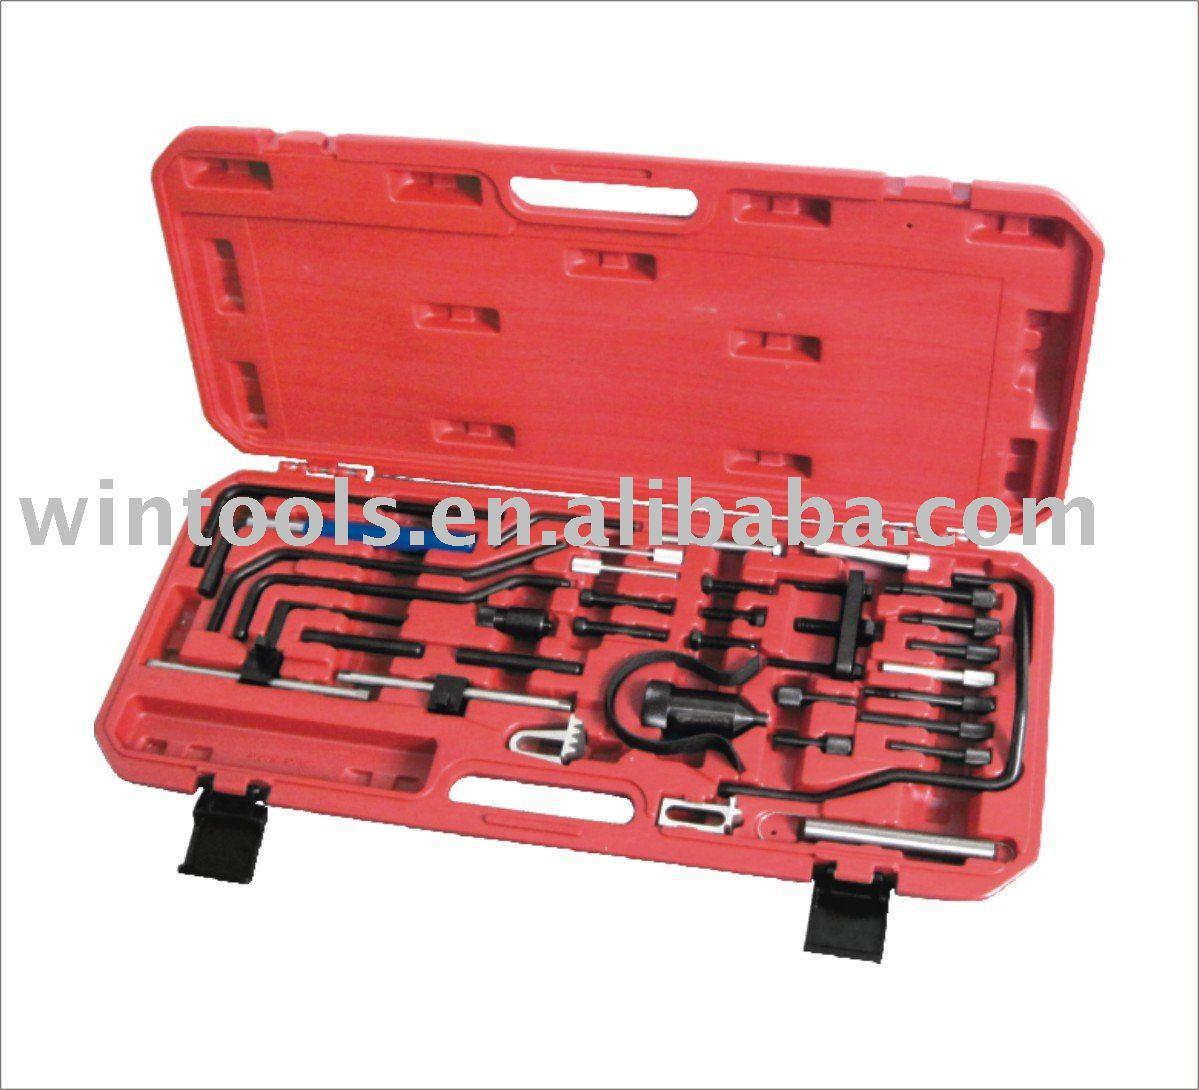 ENGINE TIMING TOOL SET for CITROEN &amp; PEUGEOT WT04176<br><br>Aliexpress